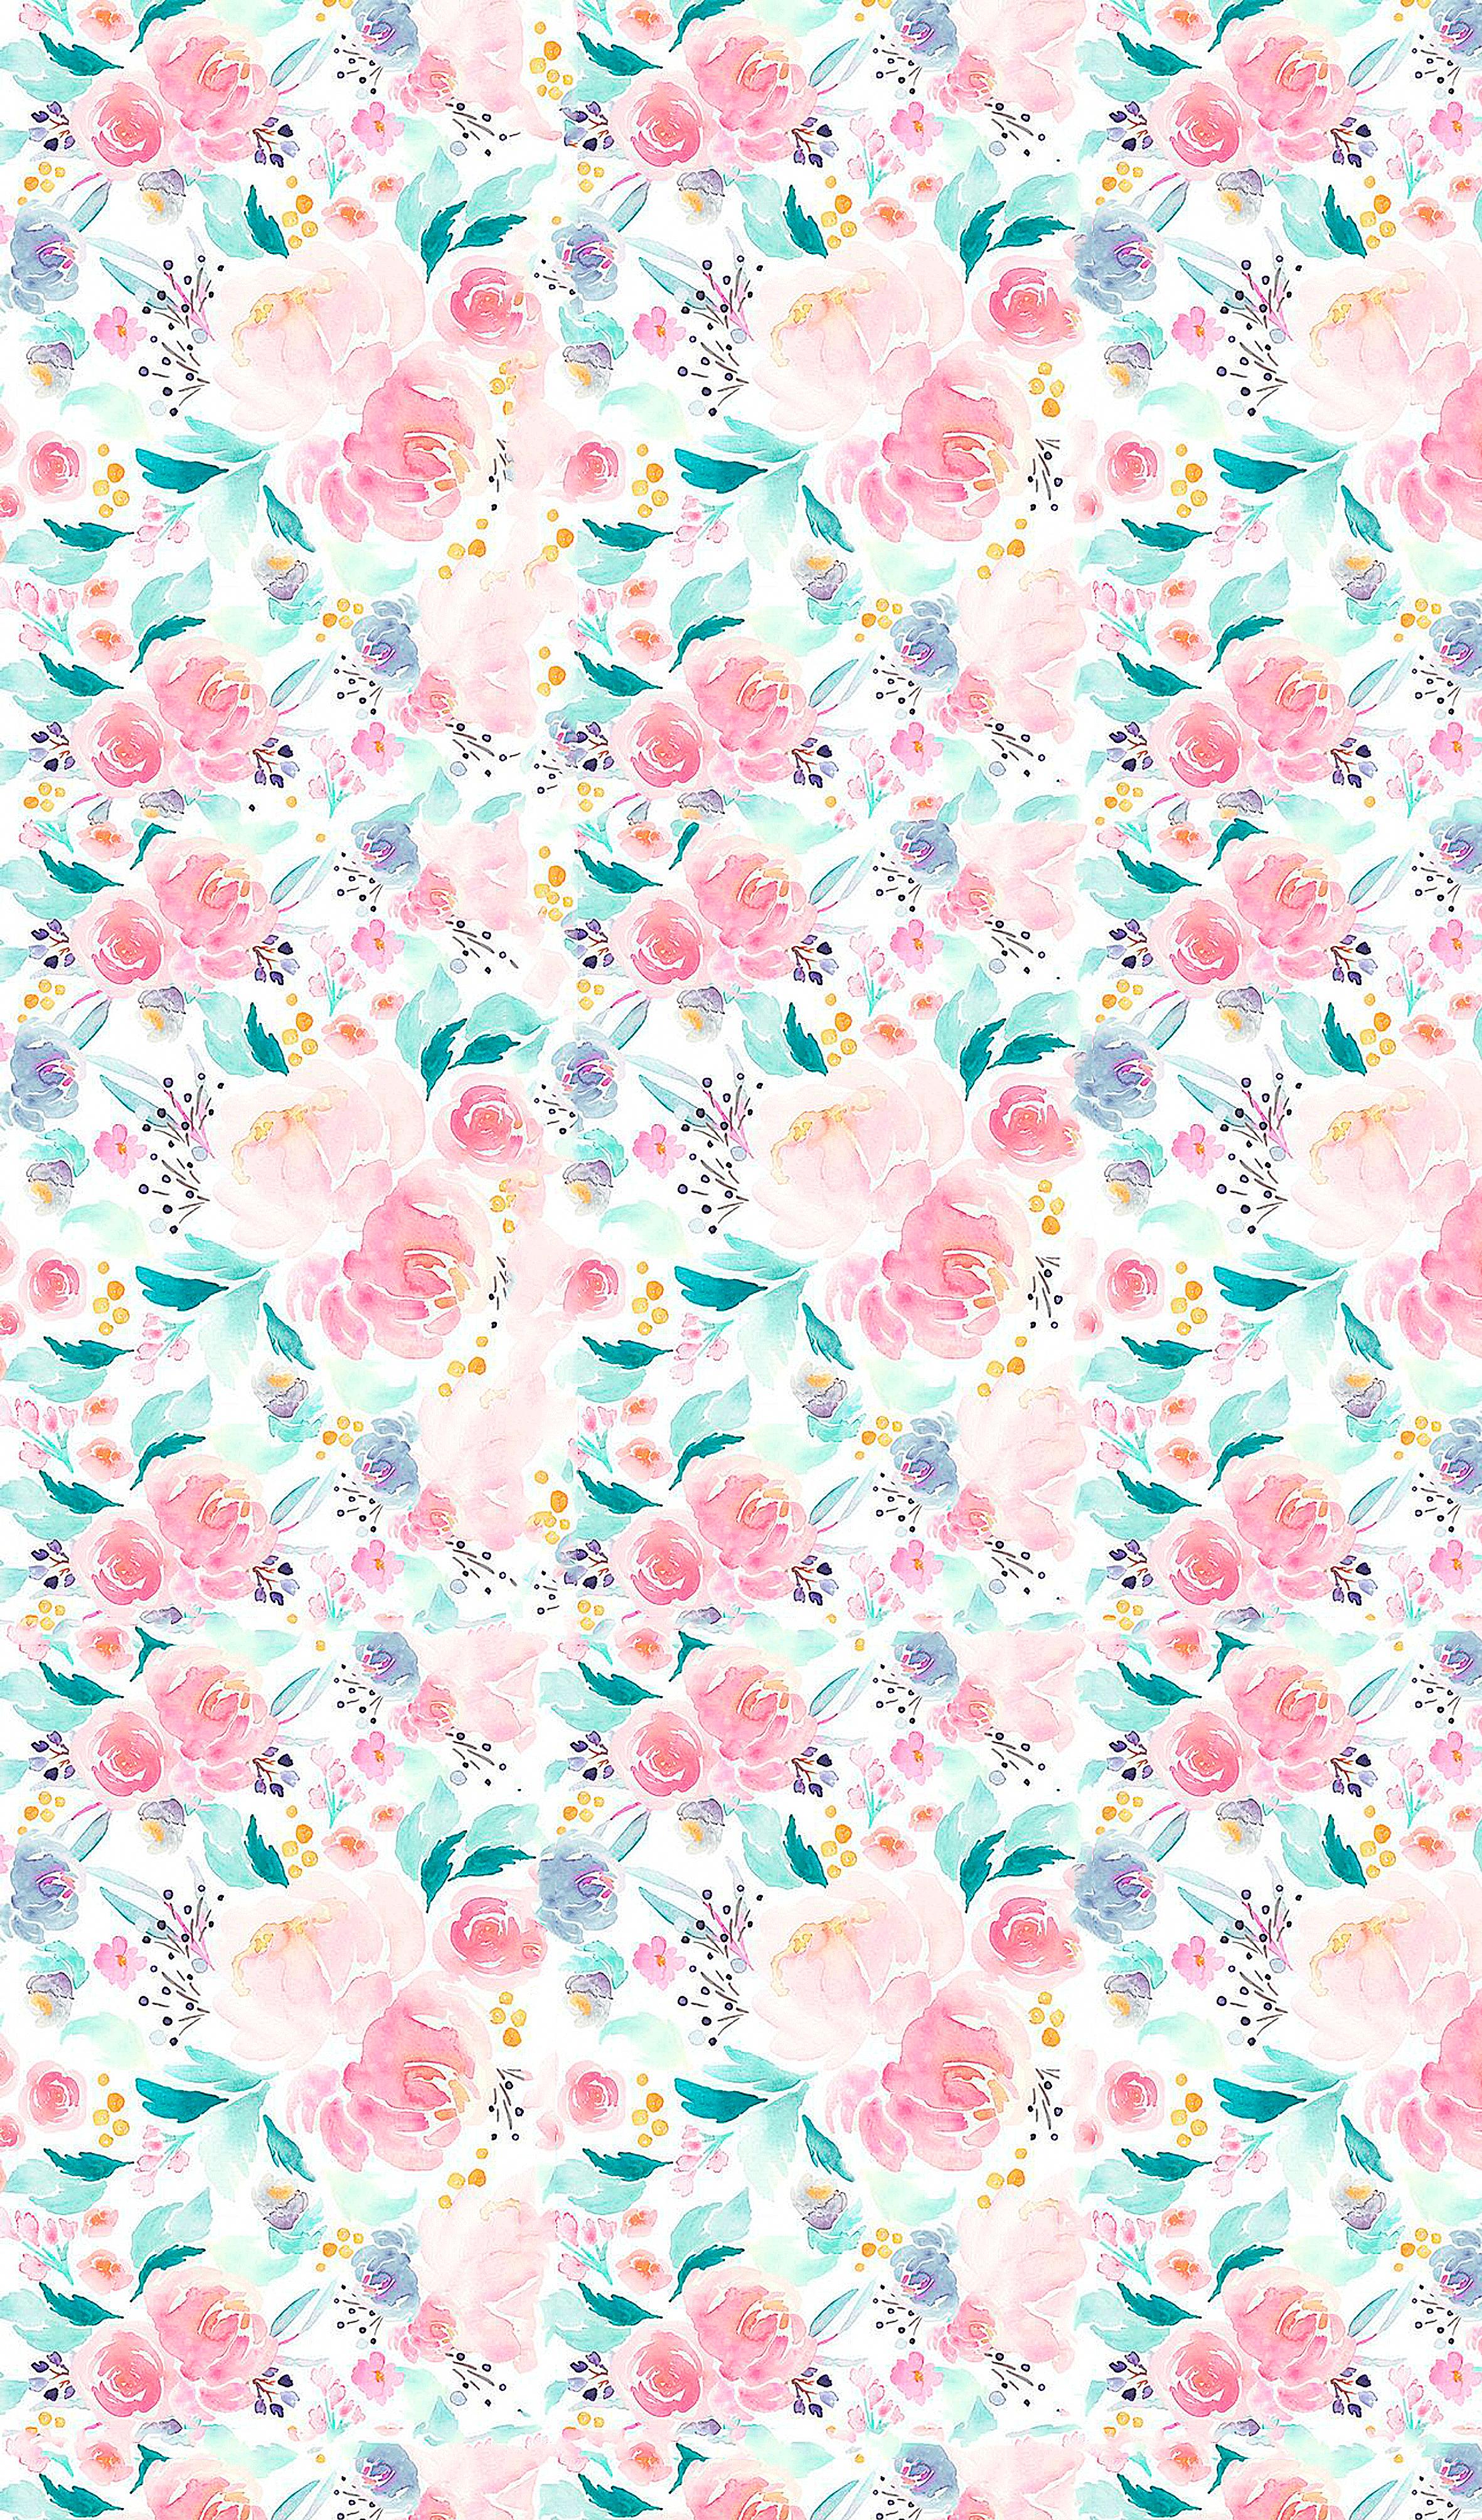 Wallpaper Iphone Iphonewallpapertumblr Iphone Wallpaper Pattern Iphone Wallpaper Vintage Wallpaper Iphone Cute